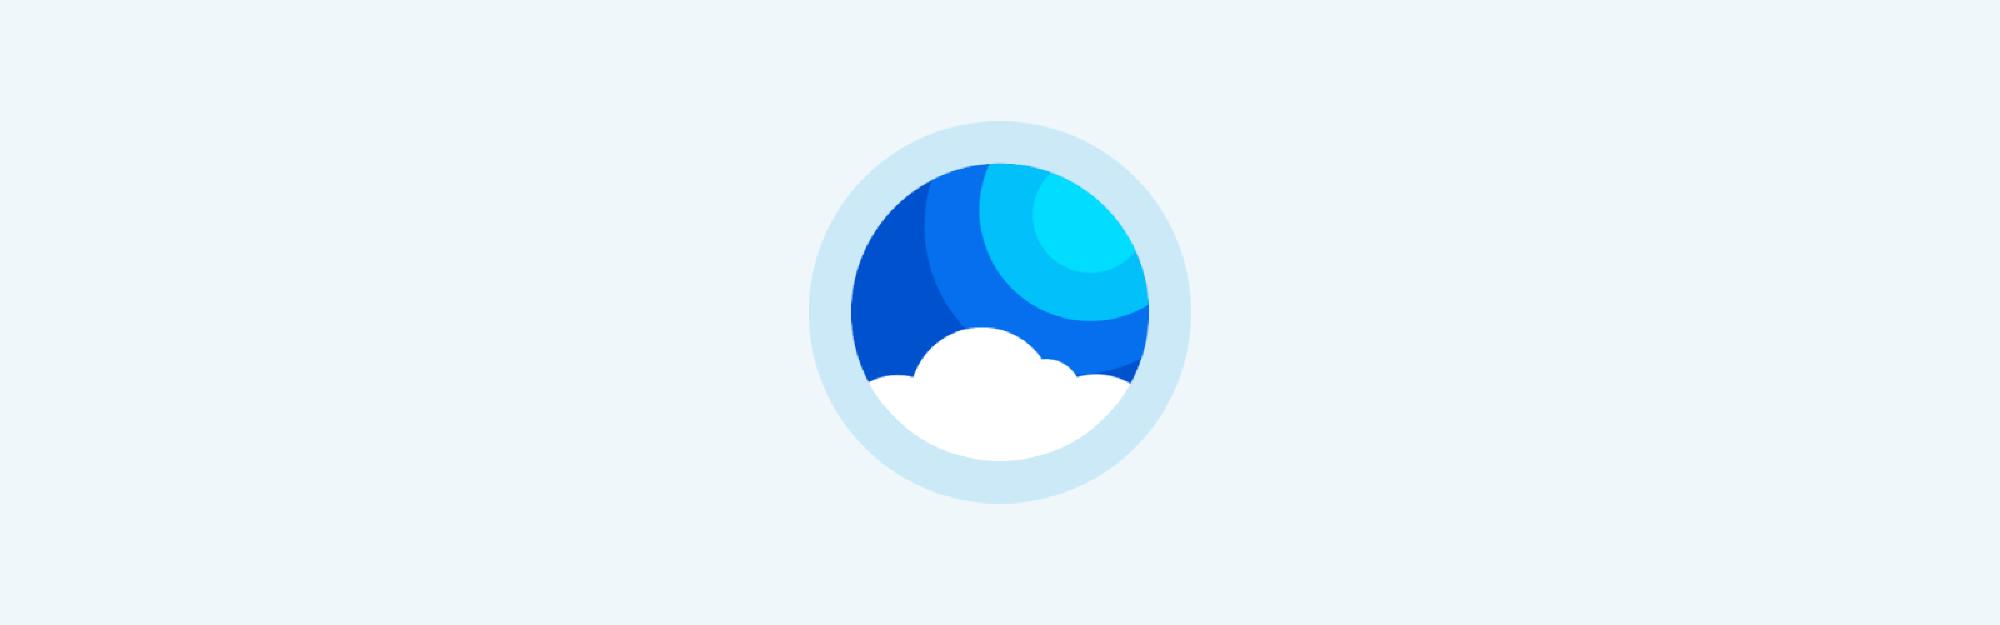 cloudreve搭建和挂载OneDrive云盘